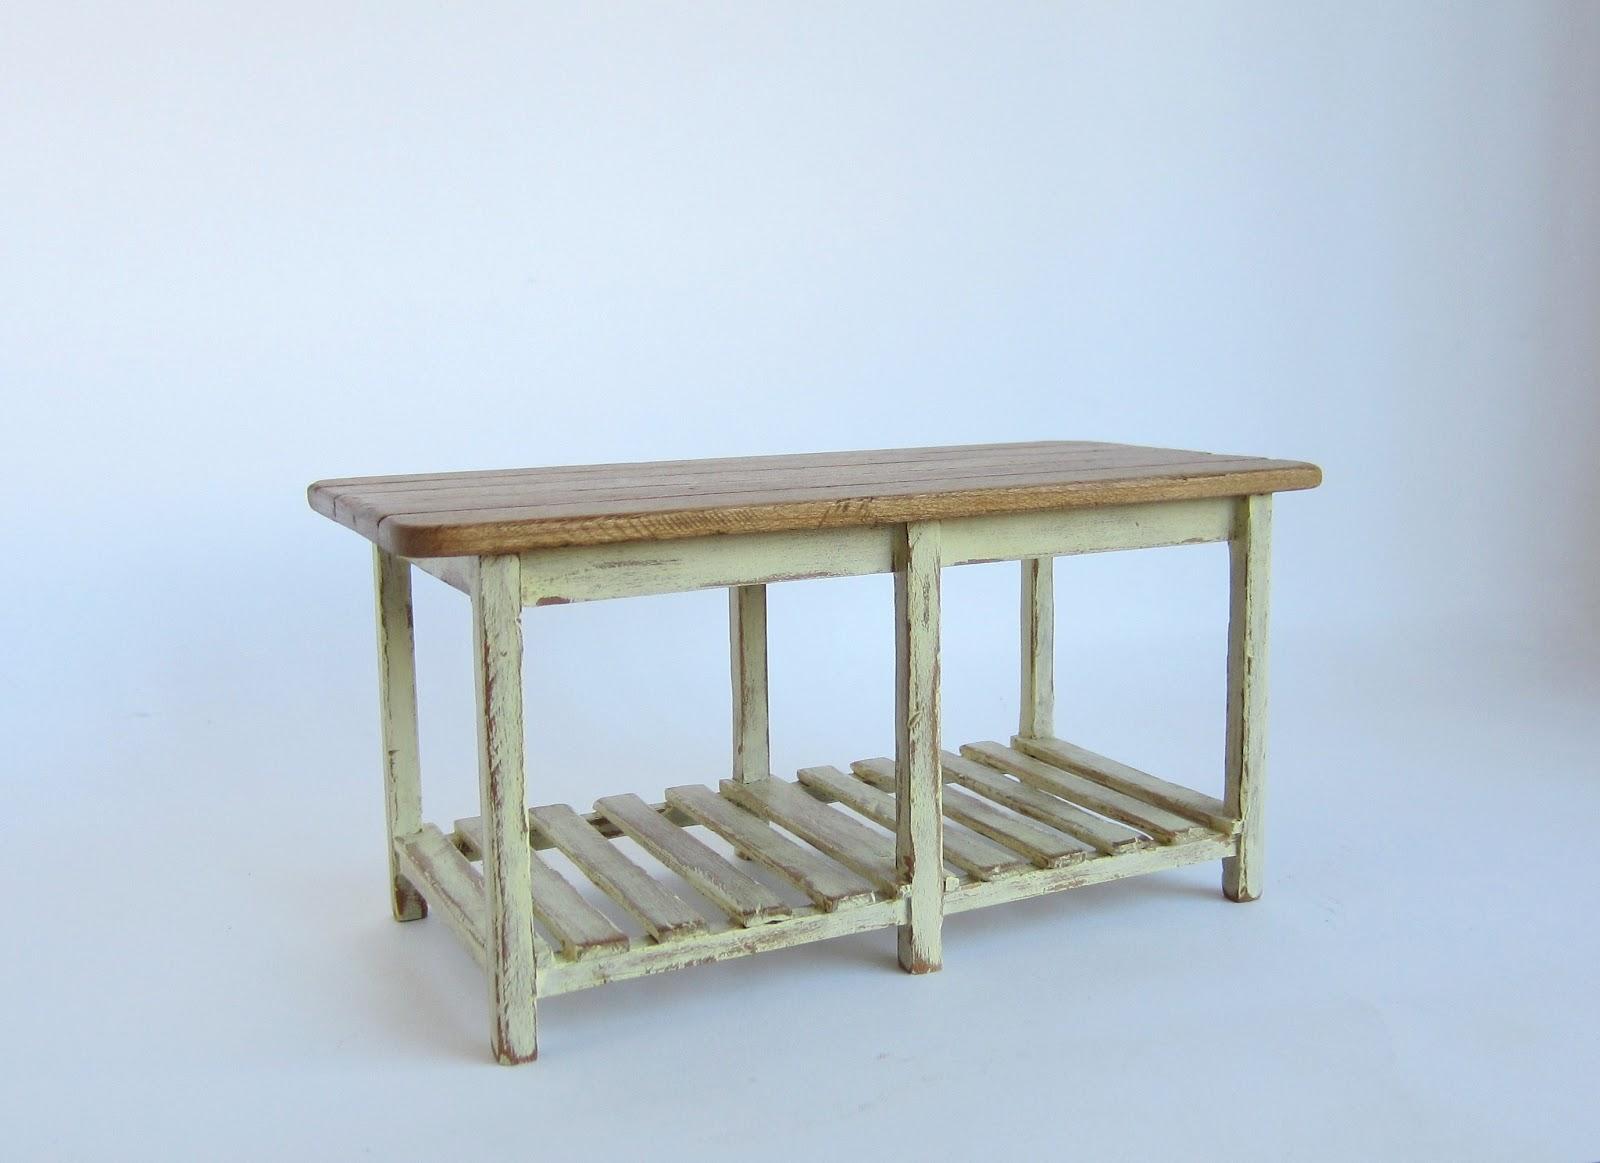 Muebles en miniatura miniature furniture for Mesas de trabajo para cocina